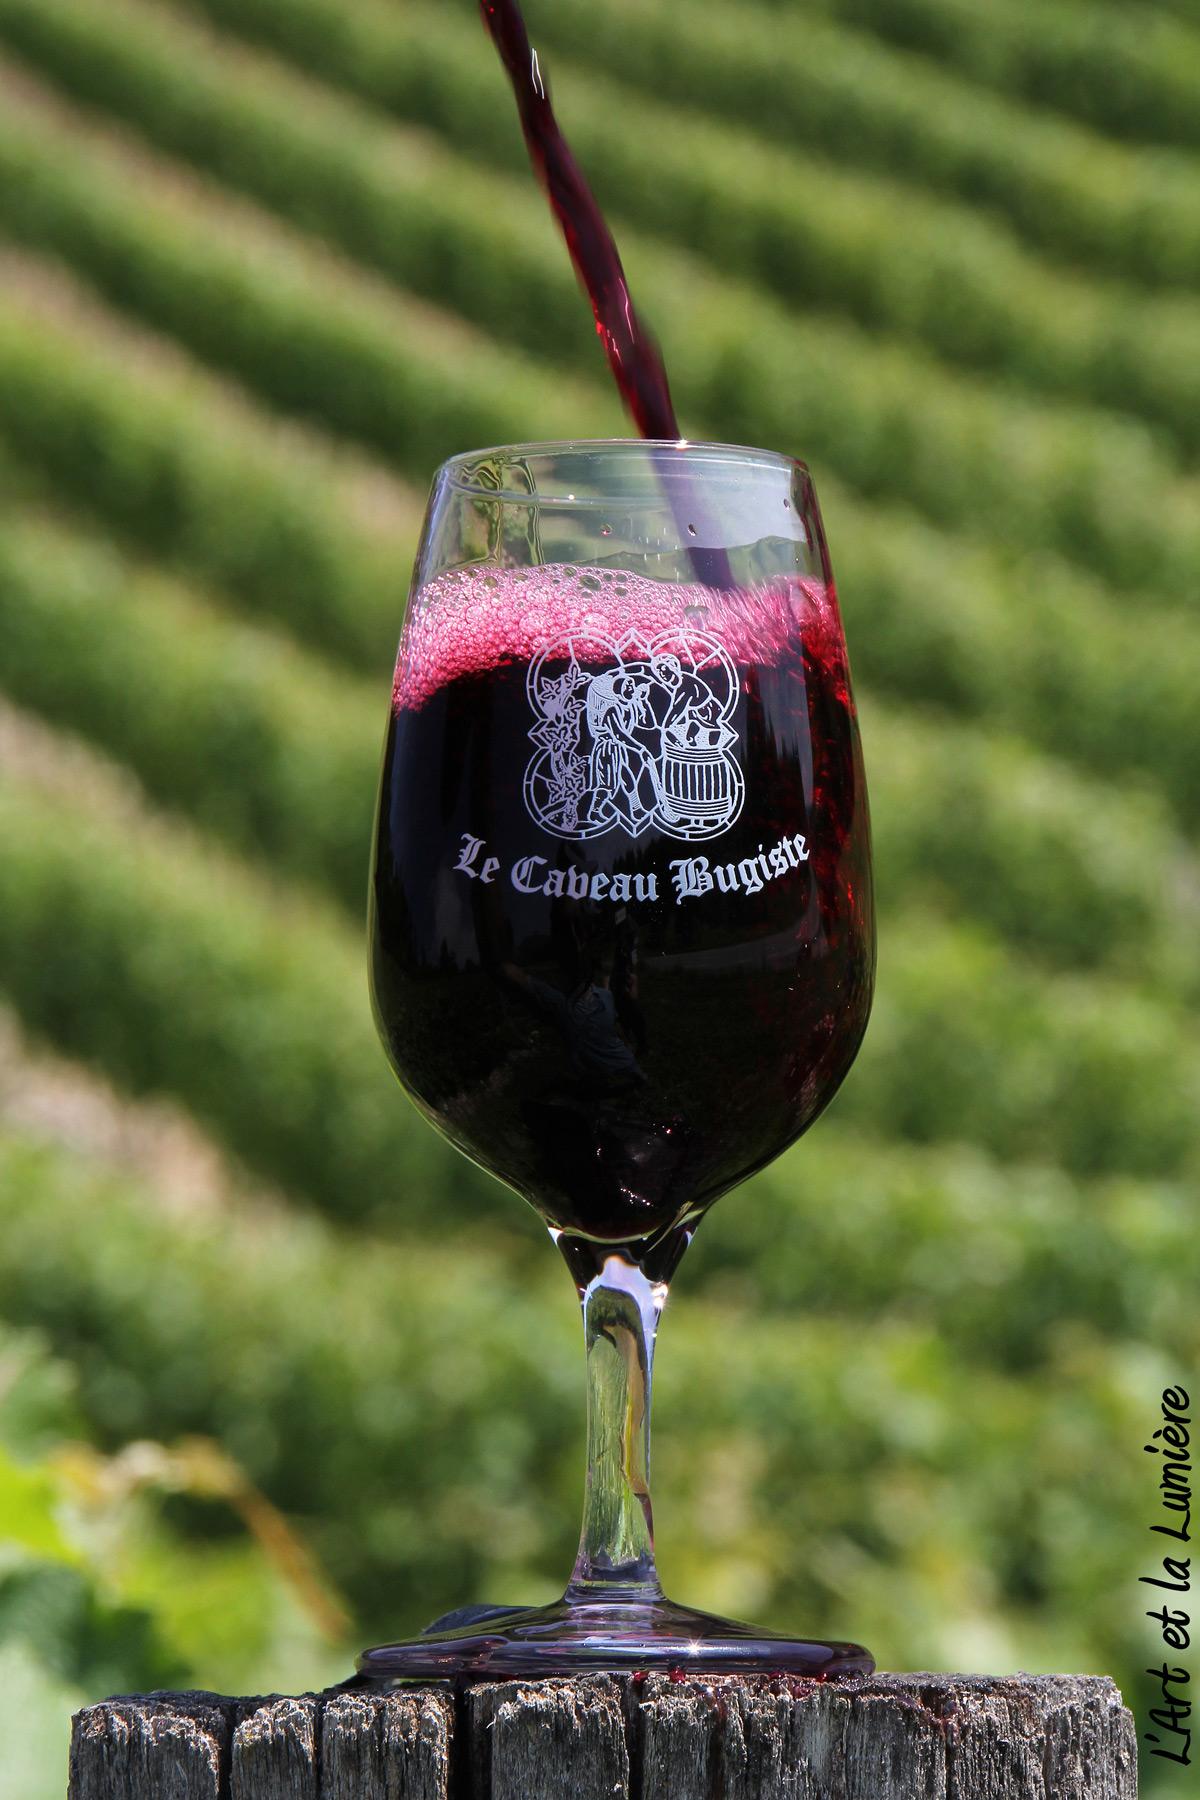 Verre de vin rouge du Bugey